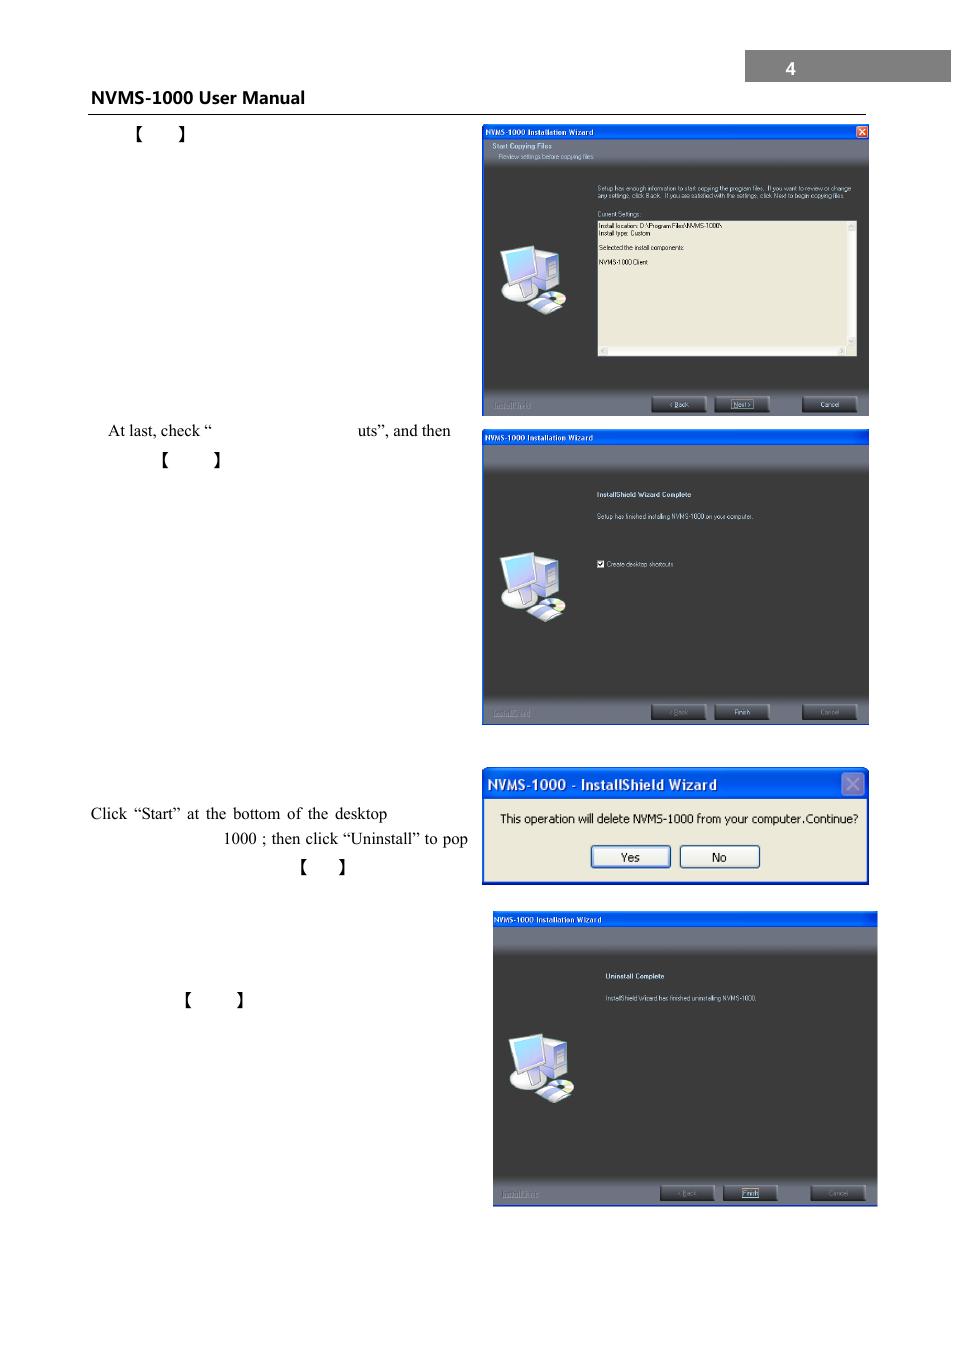 Uninstall the software | COP-USA NVMS 1000 User Manual